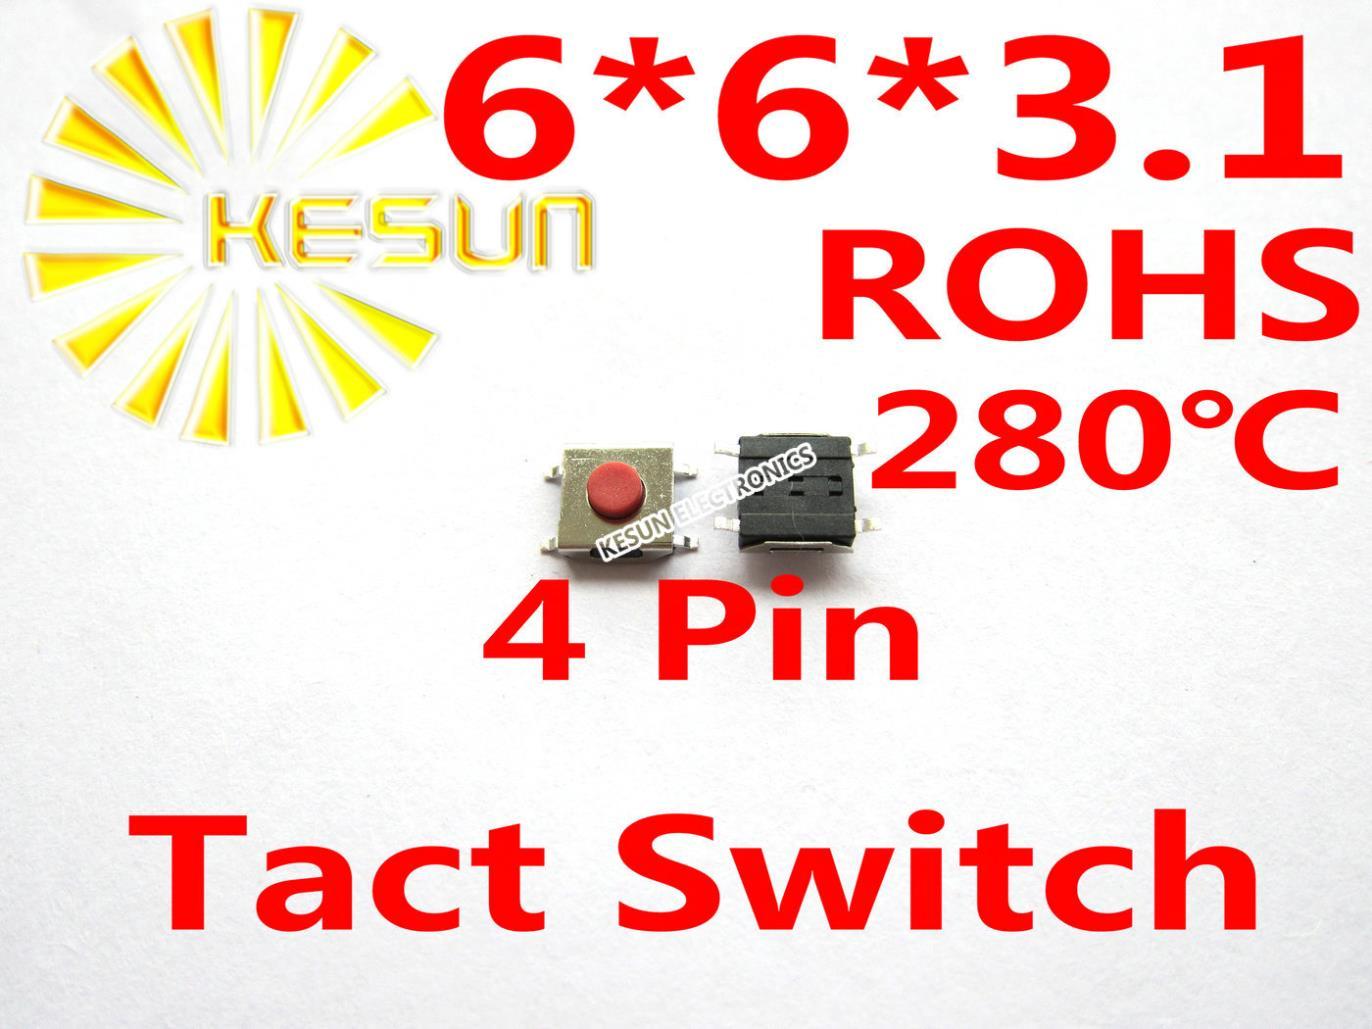 1000 Adet Smt 6x6x31 Mm 4pin Dokunsal Tact Push Button Mikro Anlk Pin Sablon Thailand 12mm Rohs Anahtar